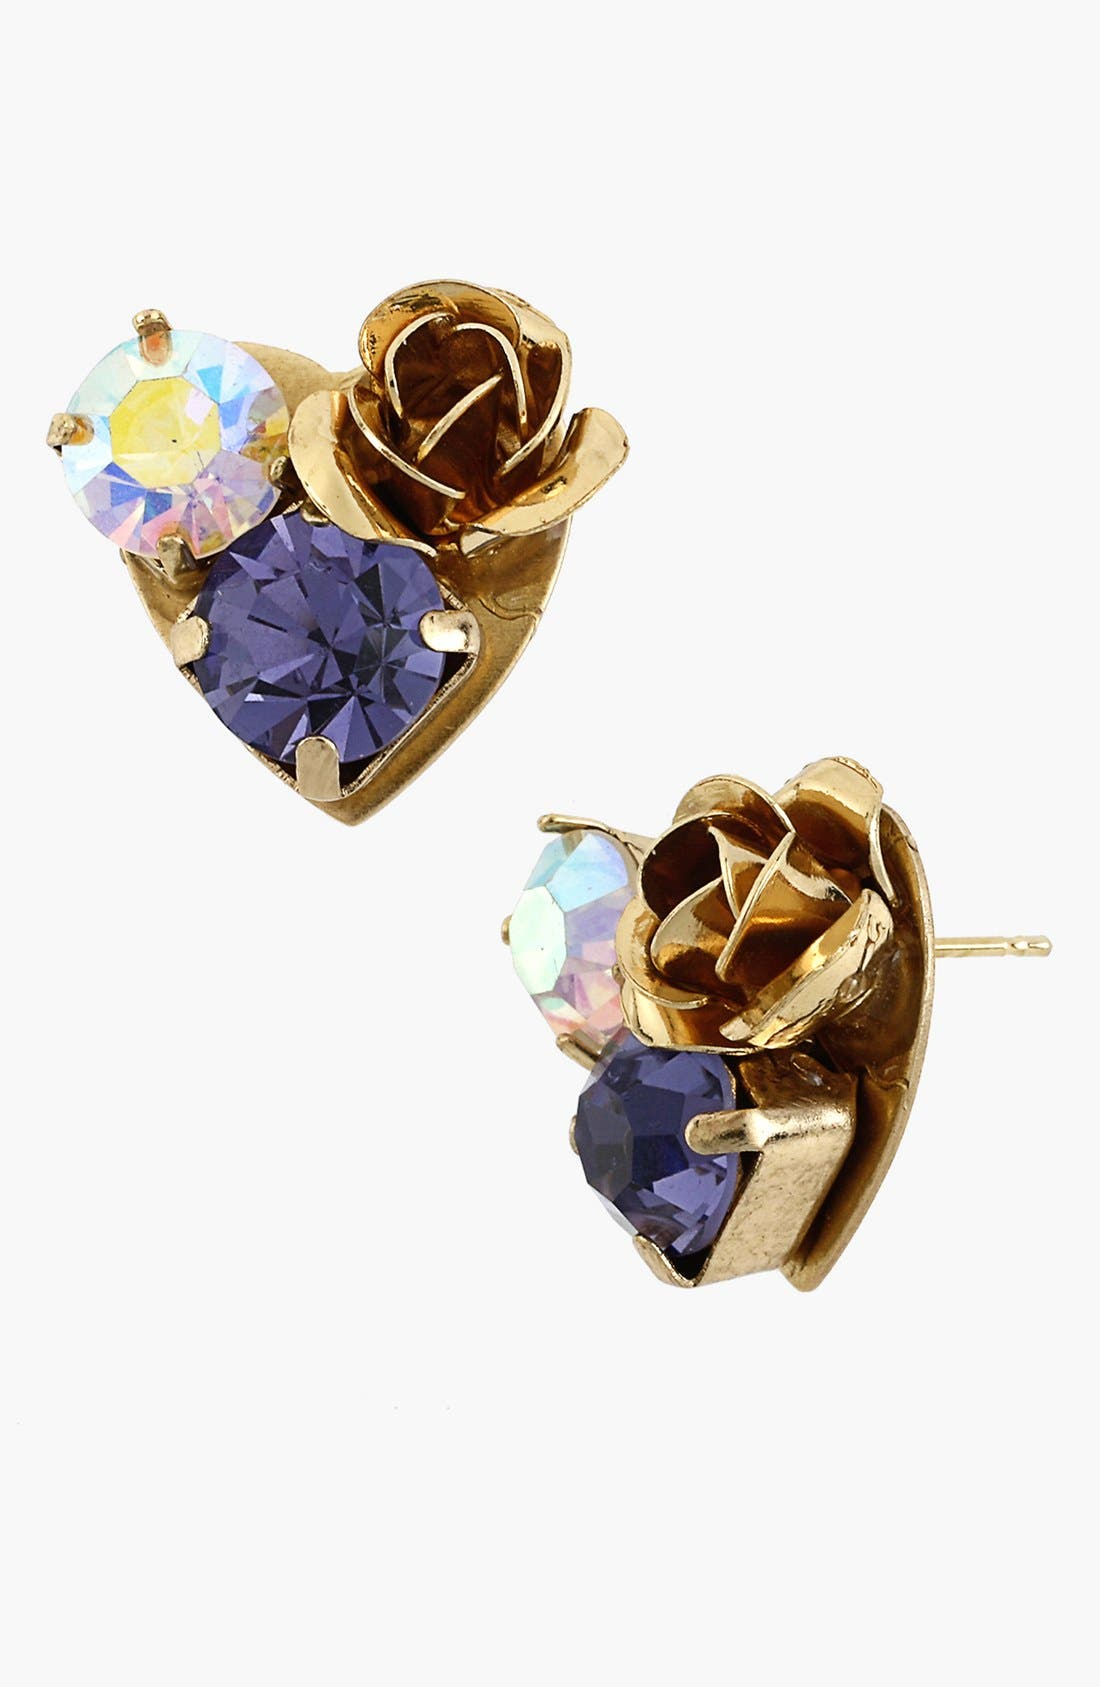 Main Image - Betsey Johnson 'Imperial' Rose Heart Stud Earrings